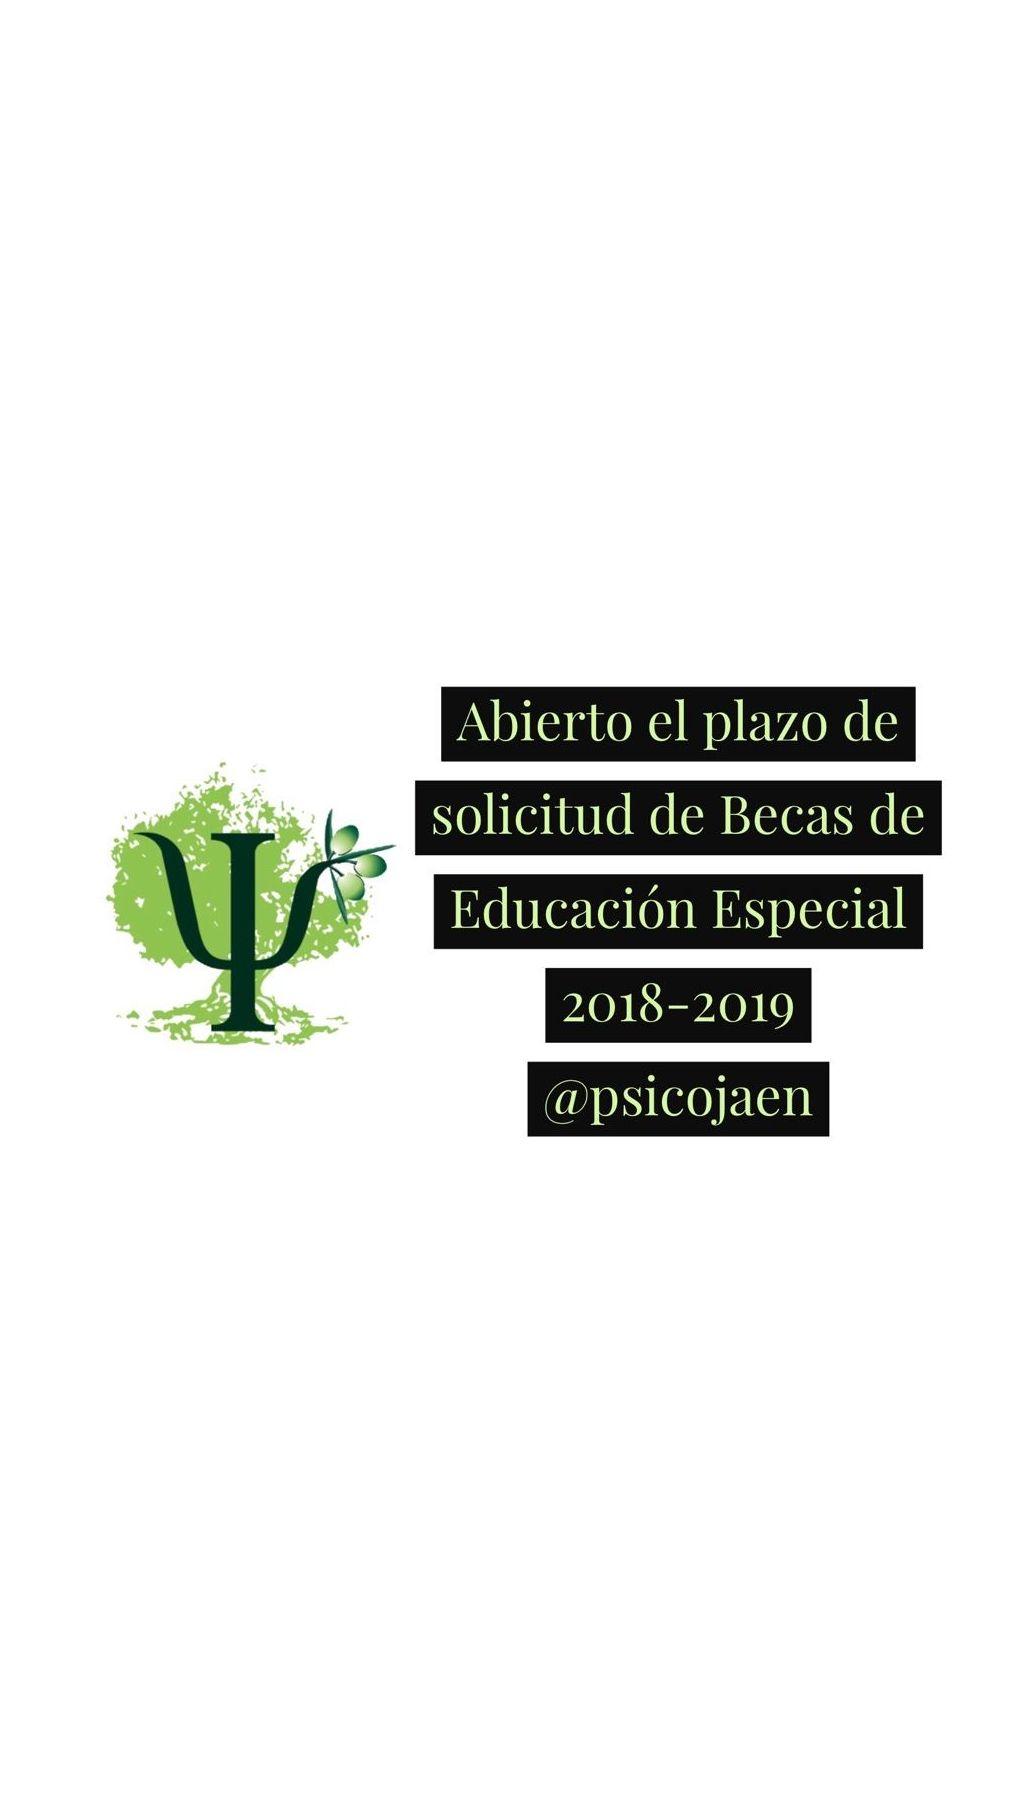 Foto 1 de Psicólogos en Jaén | PsicoJaén